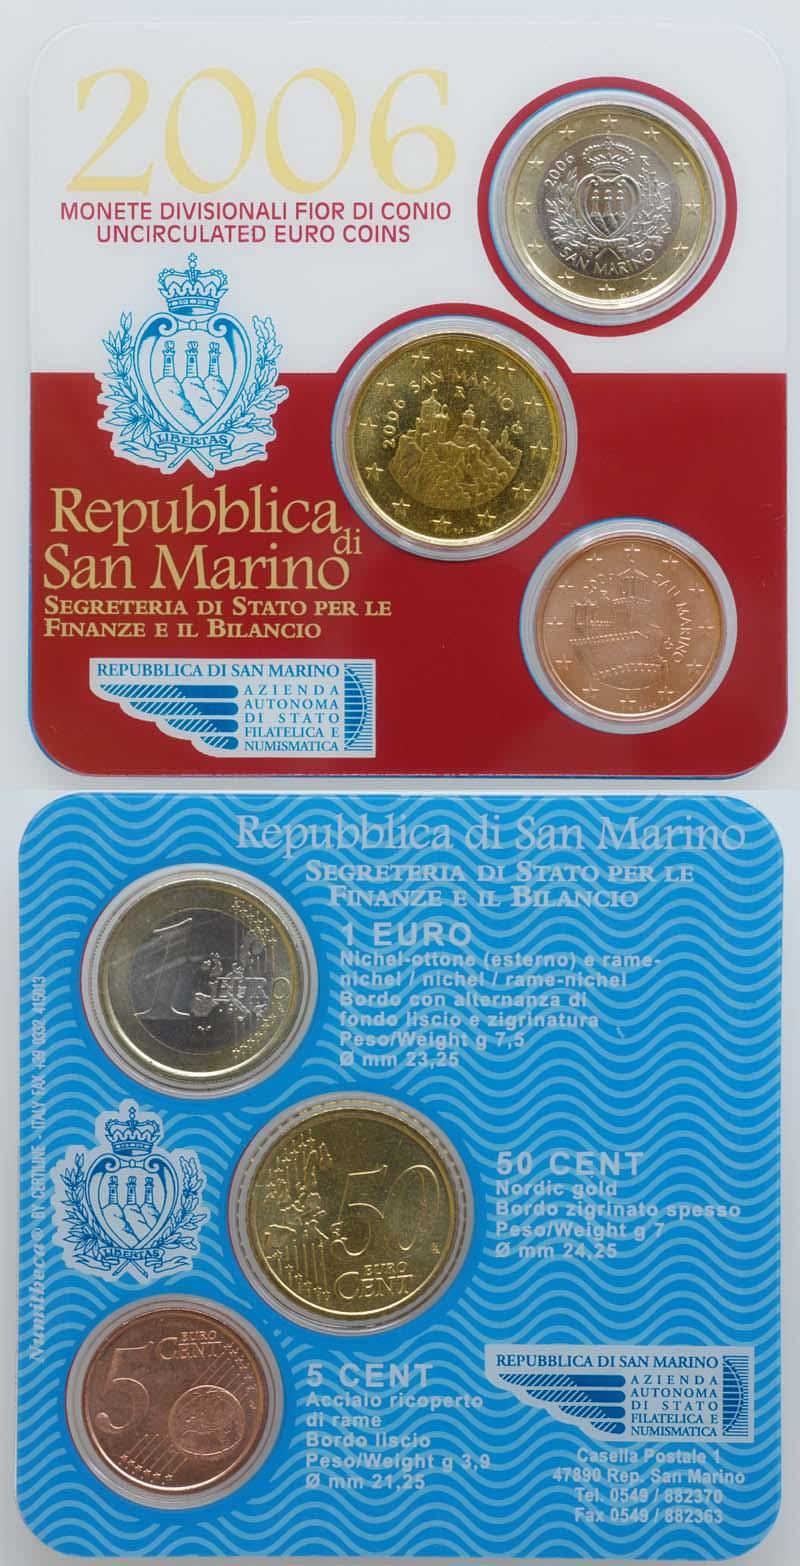 Lieferumfang:San Marino : 1,55 Euro Minikit - Set aus 1 Euro + 50 Cent + 5 Cent  2006 Stgl. Minikit San Marino 2006; KMS San Marino 2006